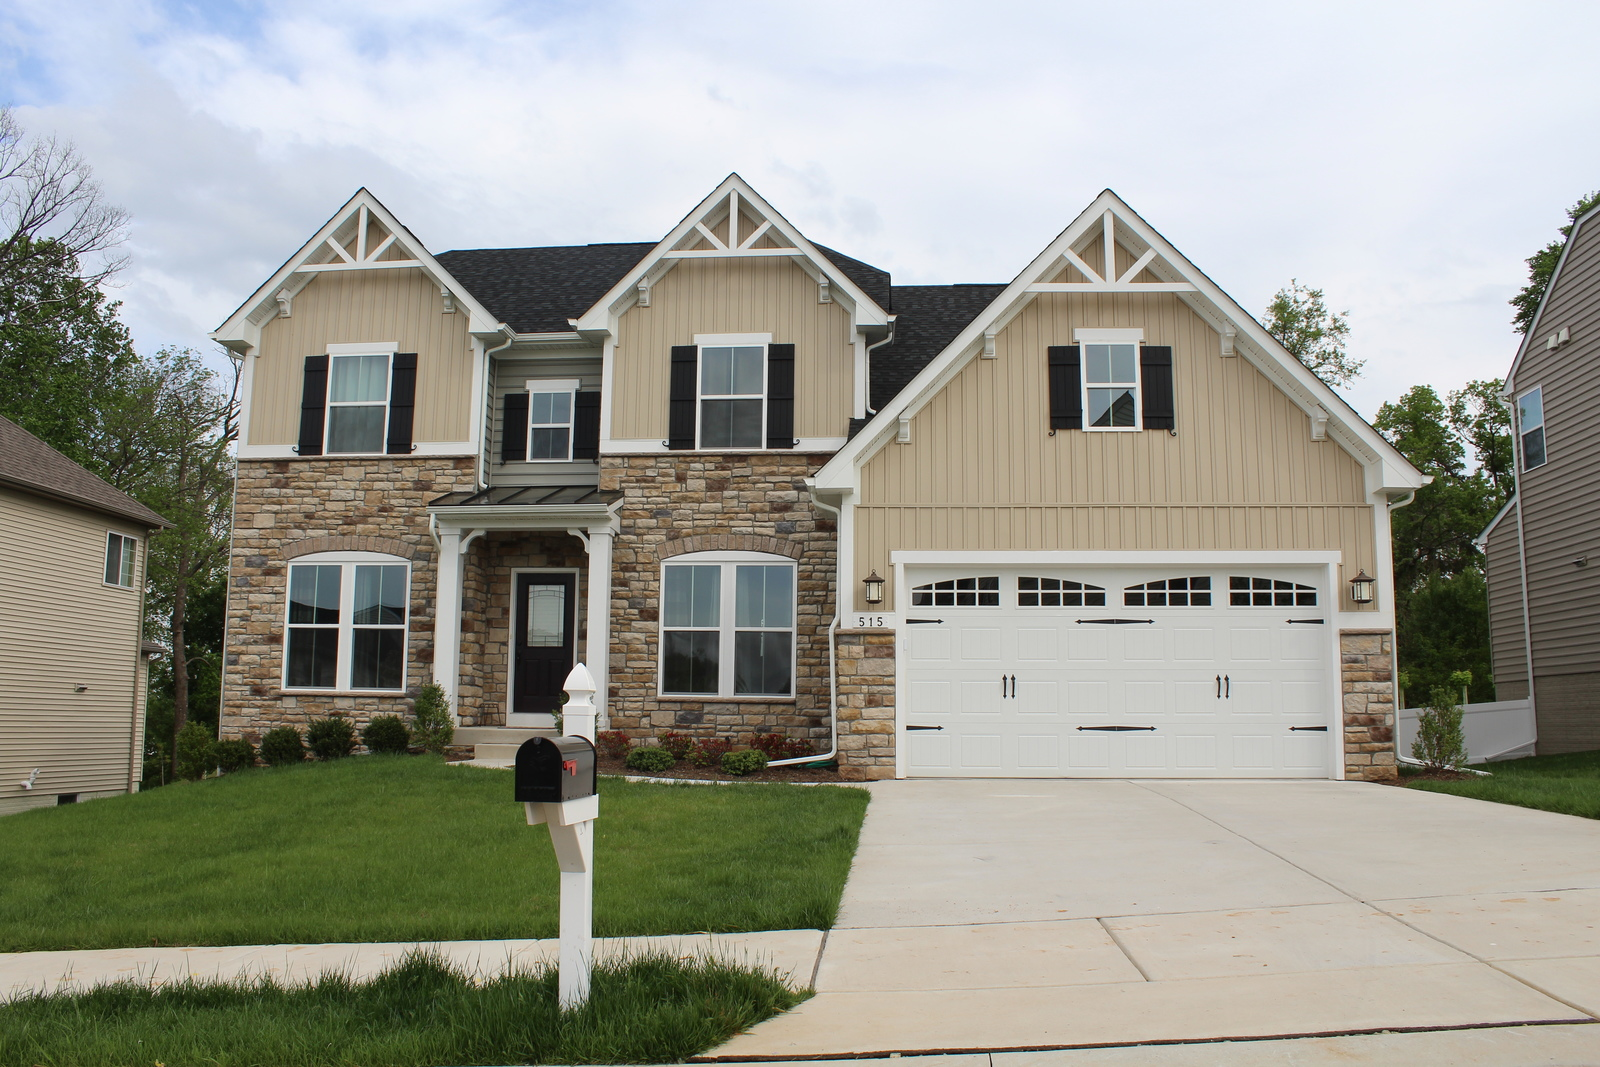 New oberlin terrace home model for sale heartland homes for Heartland house